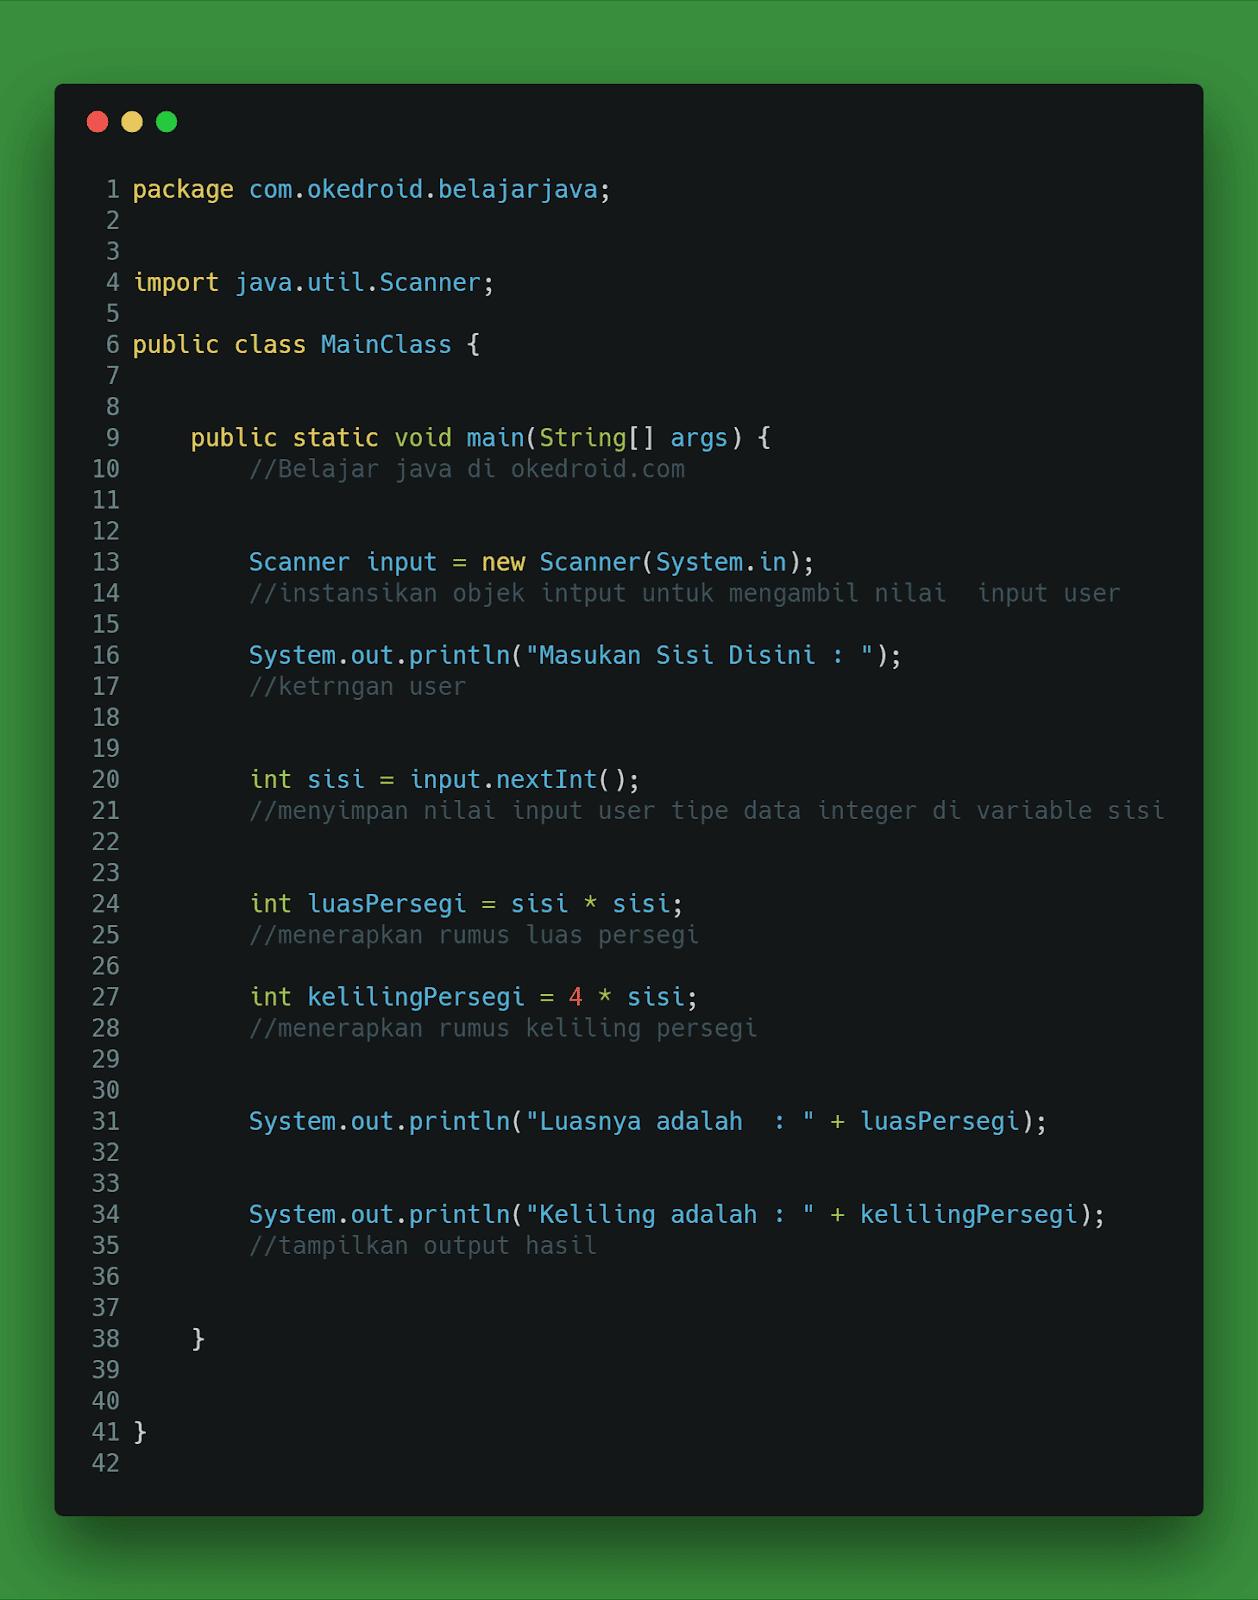 Contoh Code Program Menghitung Luas dan Keliling Persegi di Java